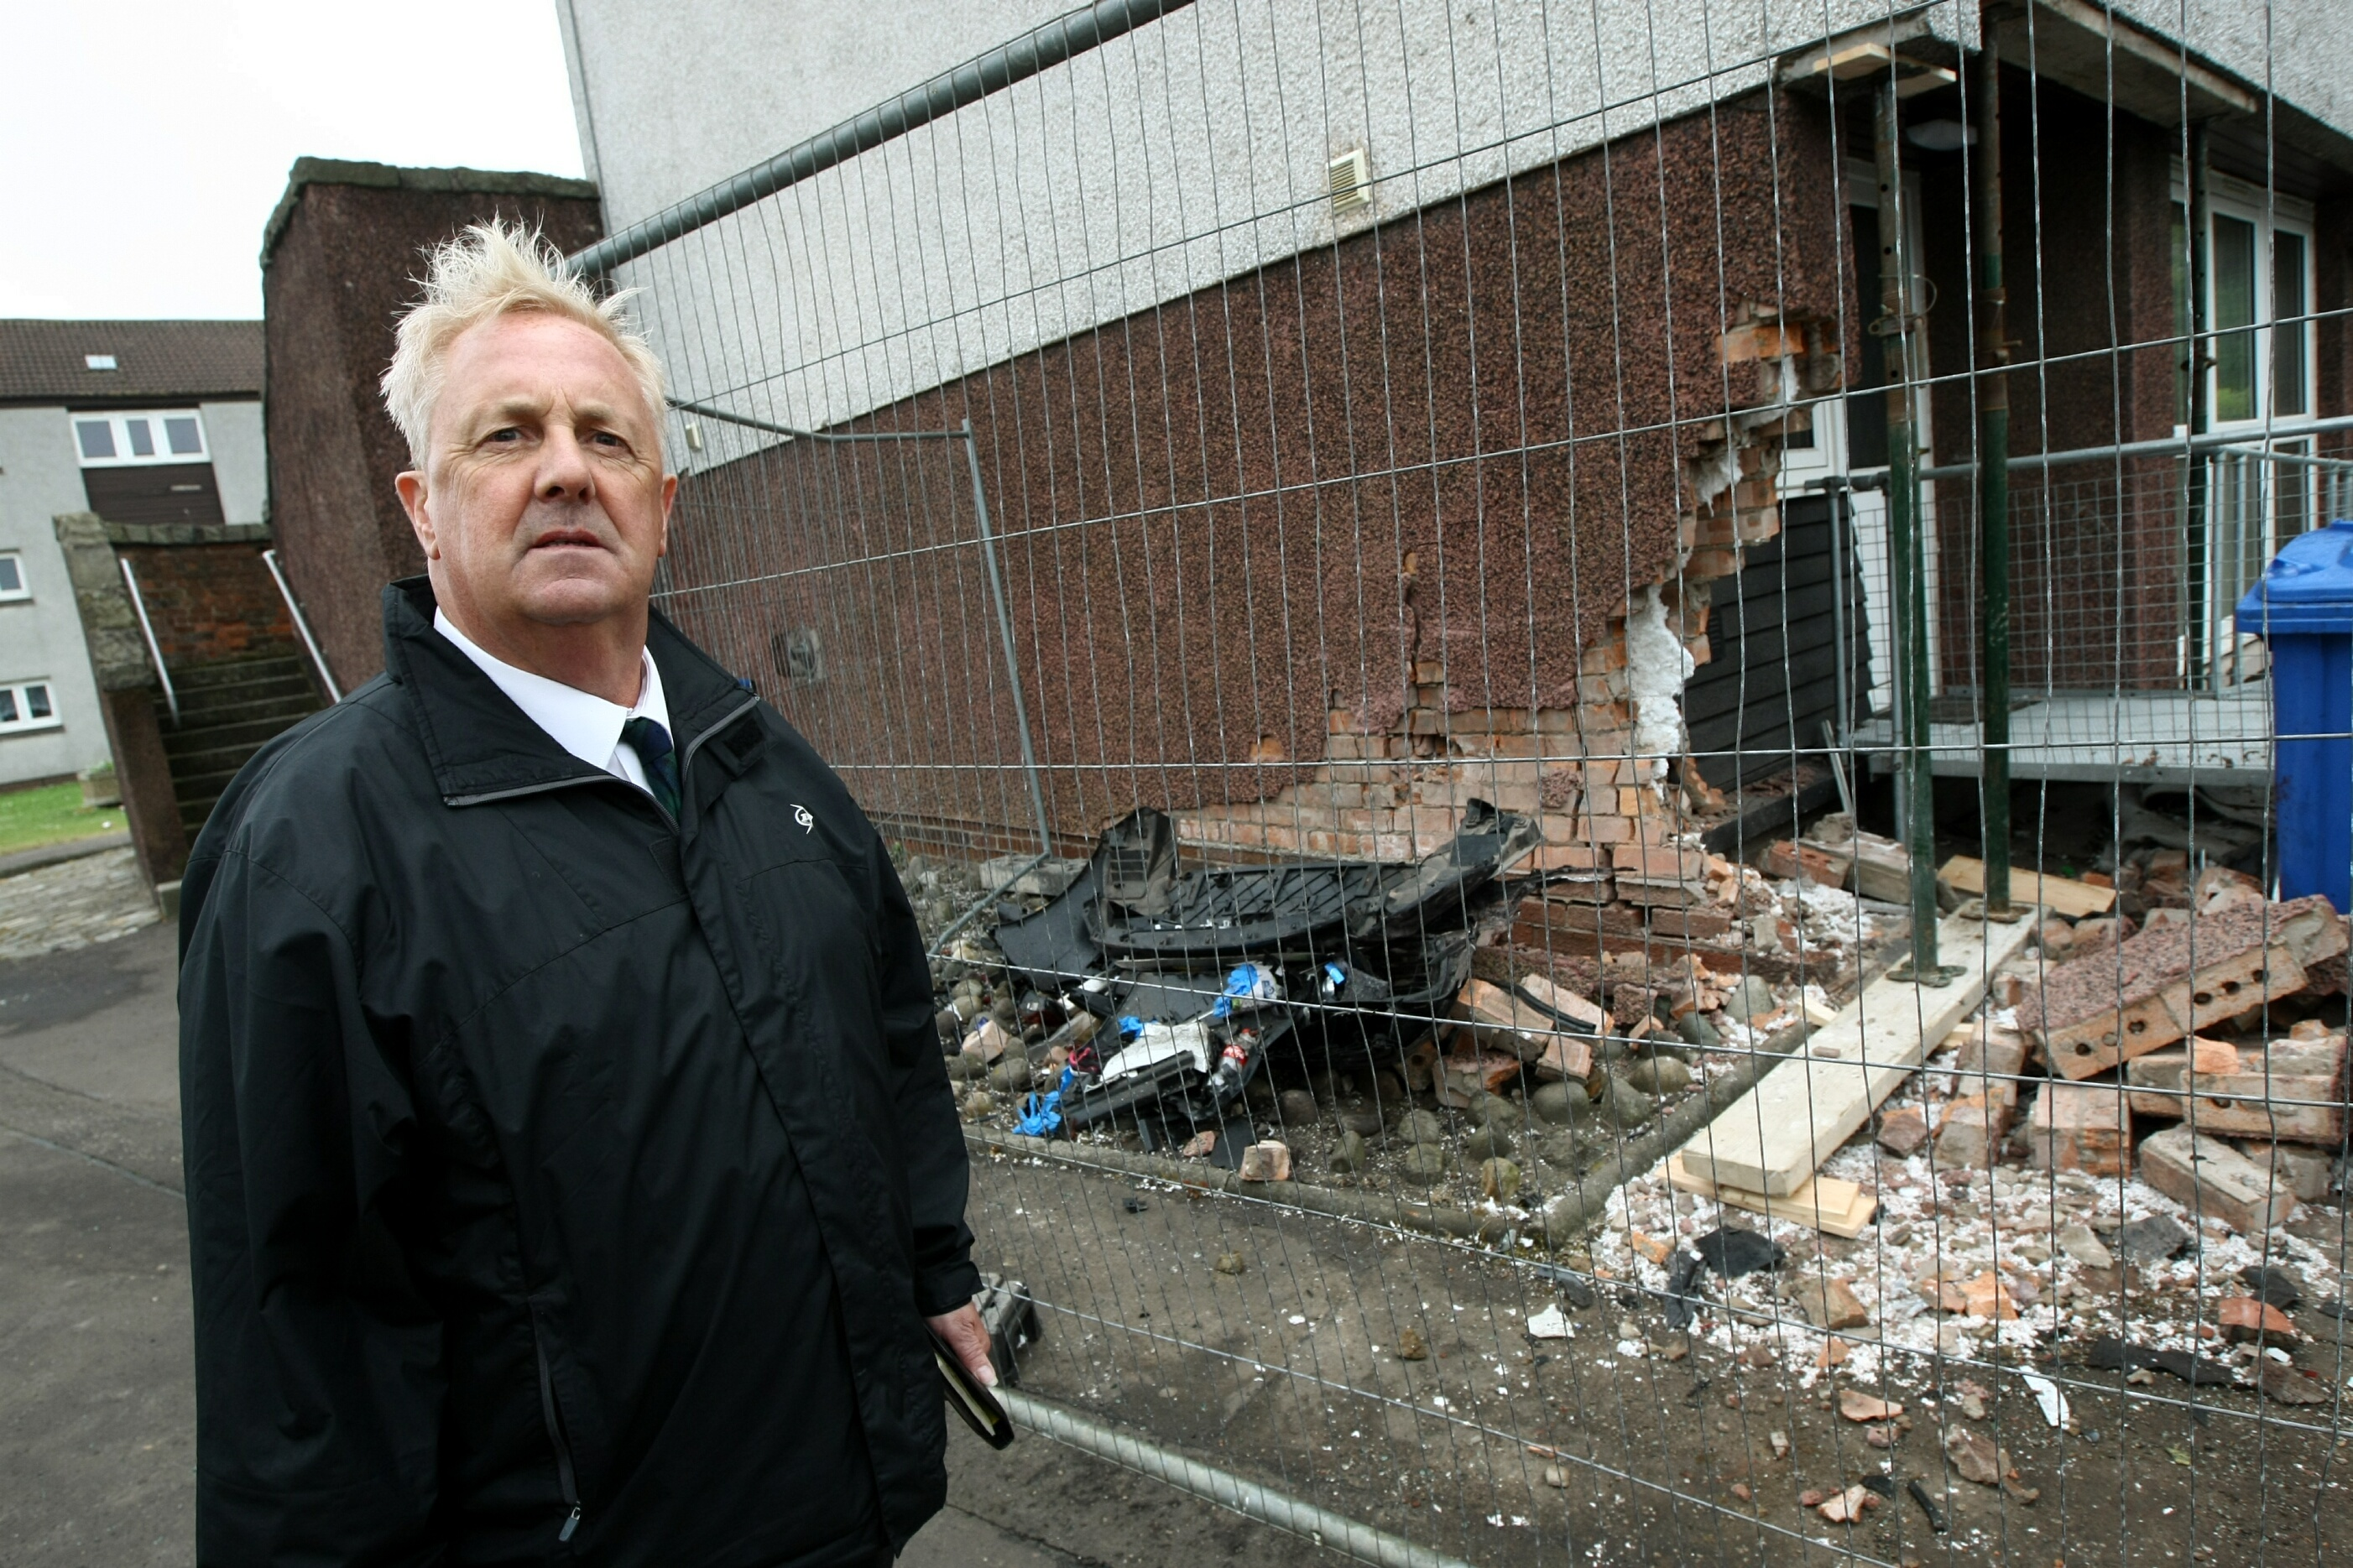 Councillor John O'Brien surveys damage to flats after a car crash in Methil.